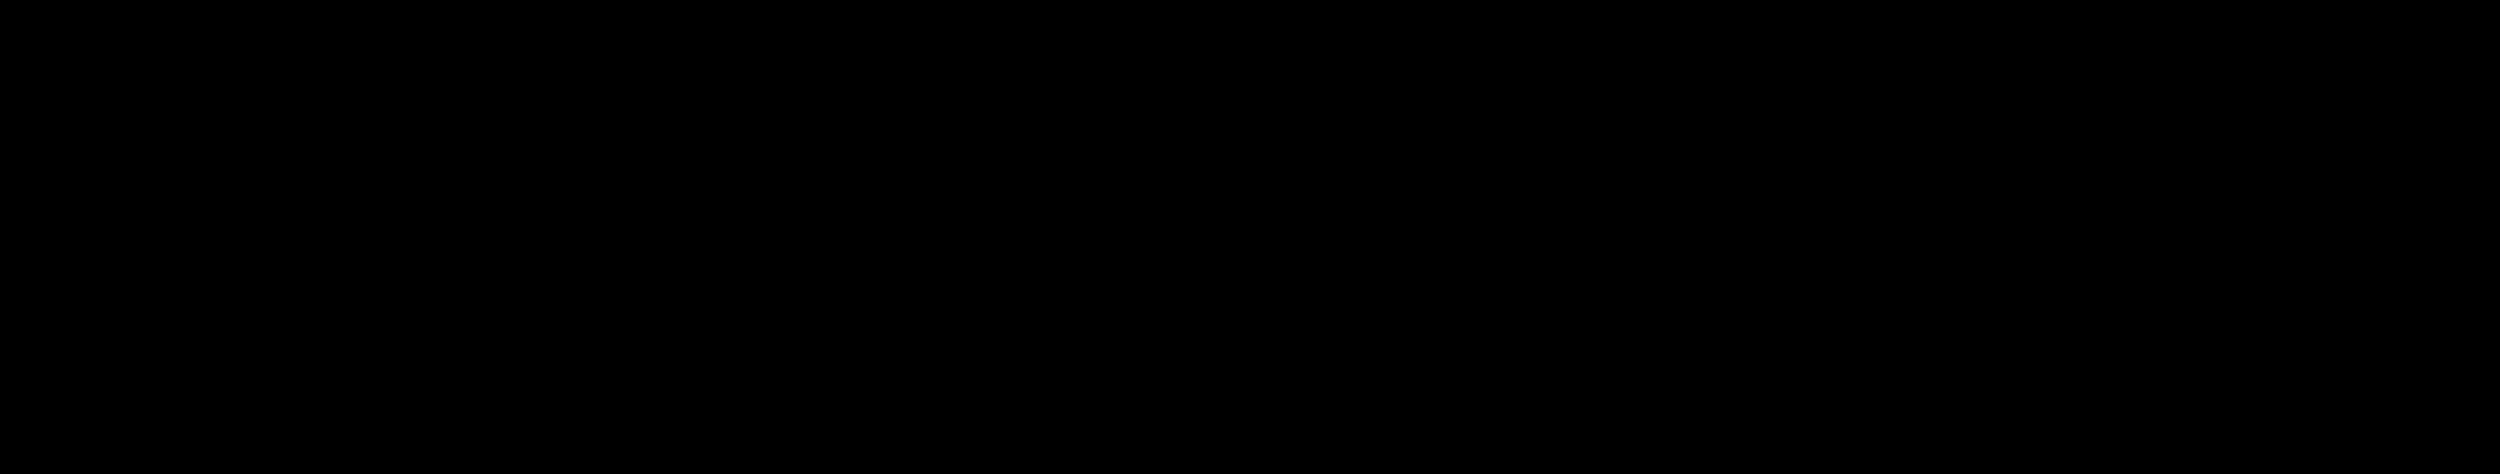 Automata_Logotype_Black[3].png